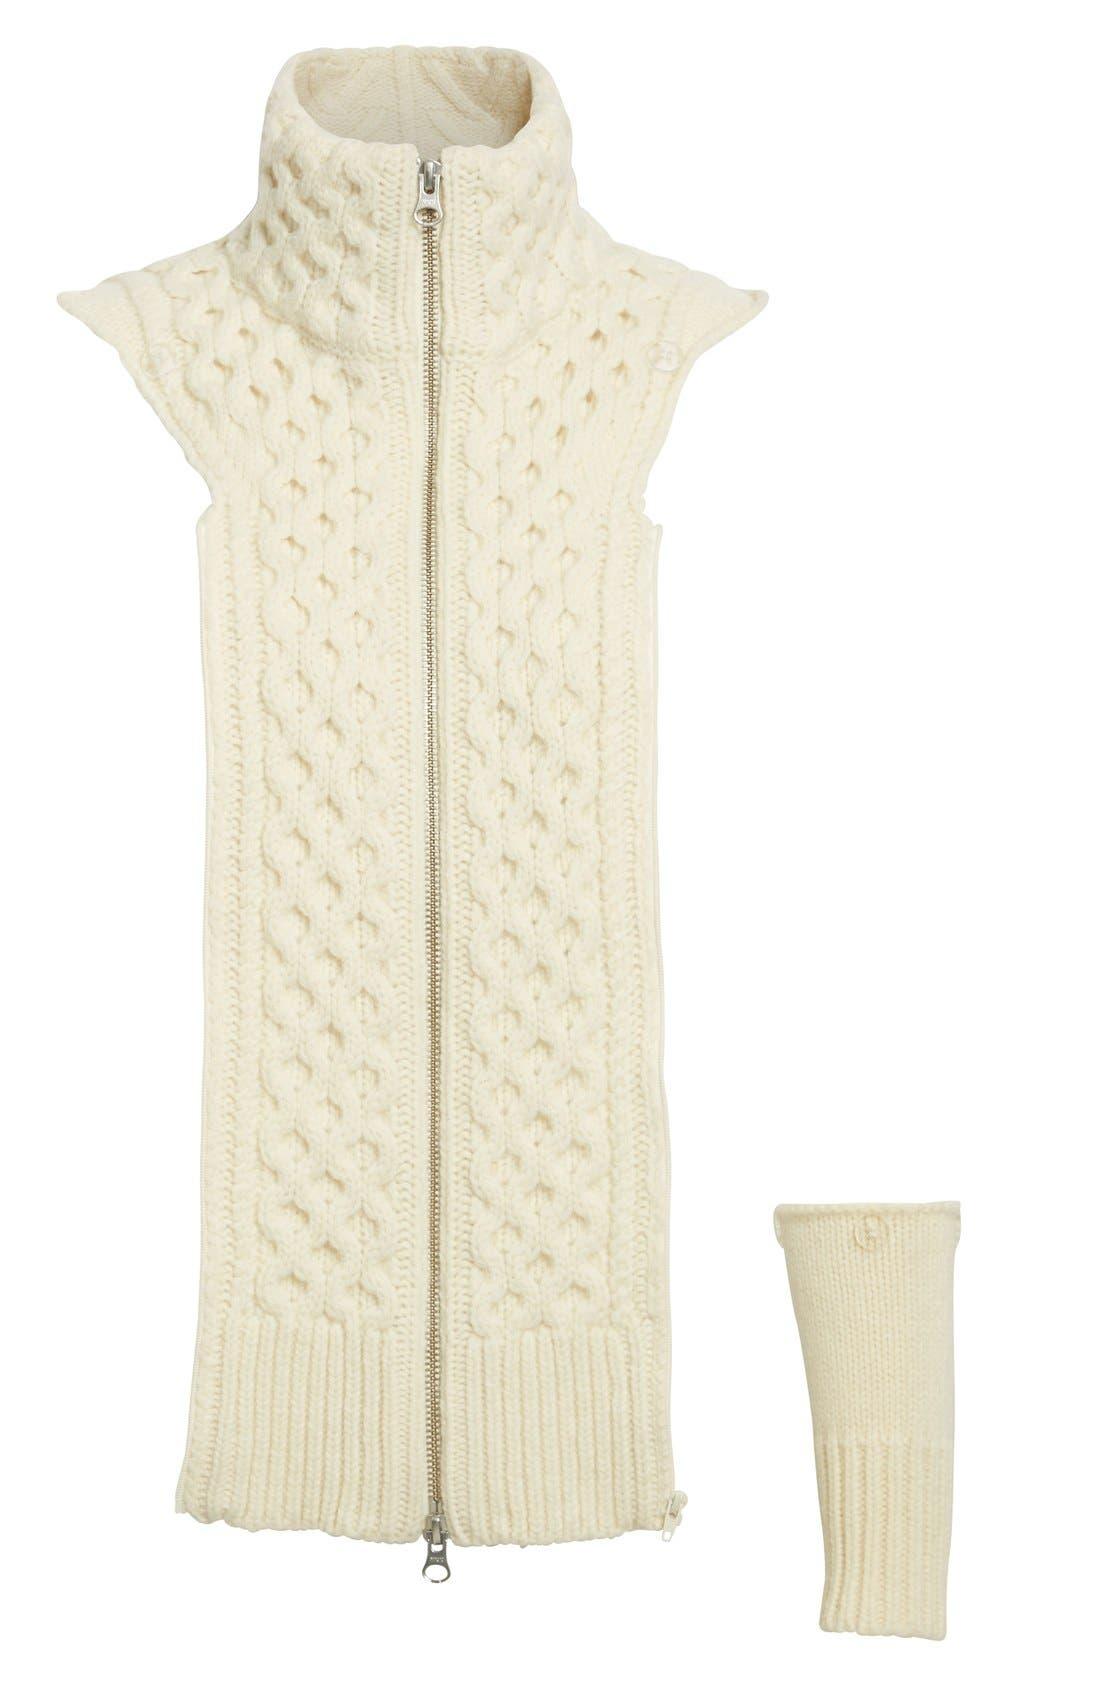 Veronica Beard 'Upstate' Wool Dickey